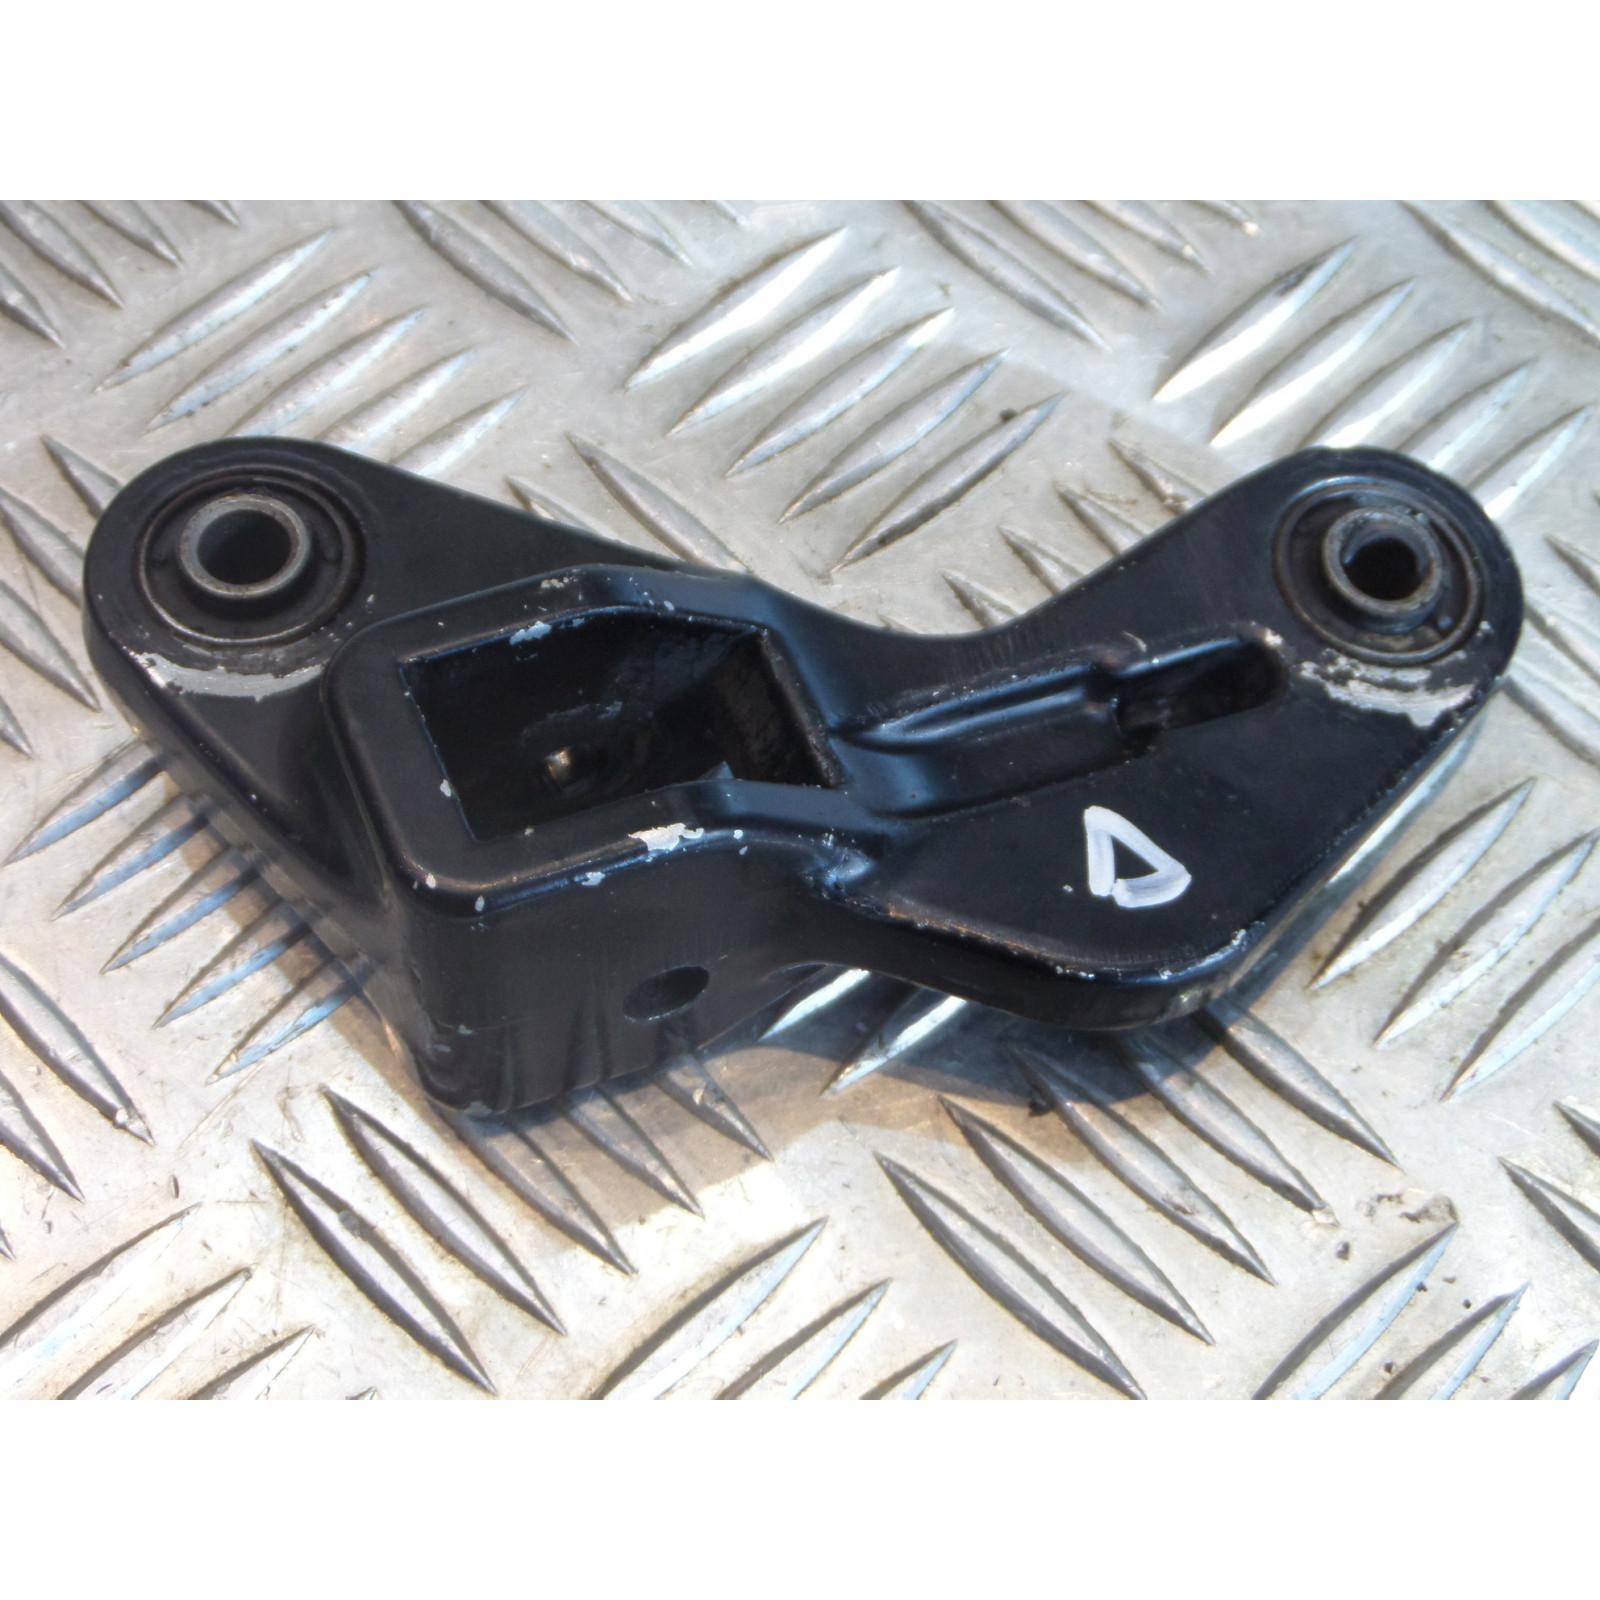 platine avant droit pour repose cale pied moto suzuki gsx 600 f gsxf js1aj 1998 - 03